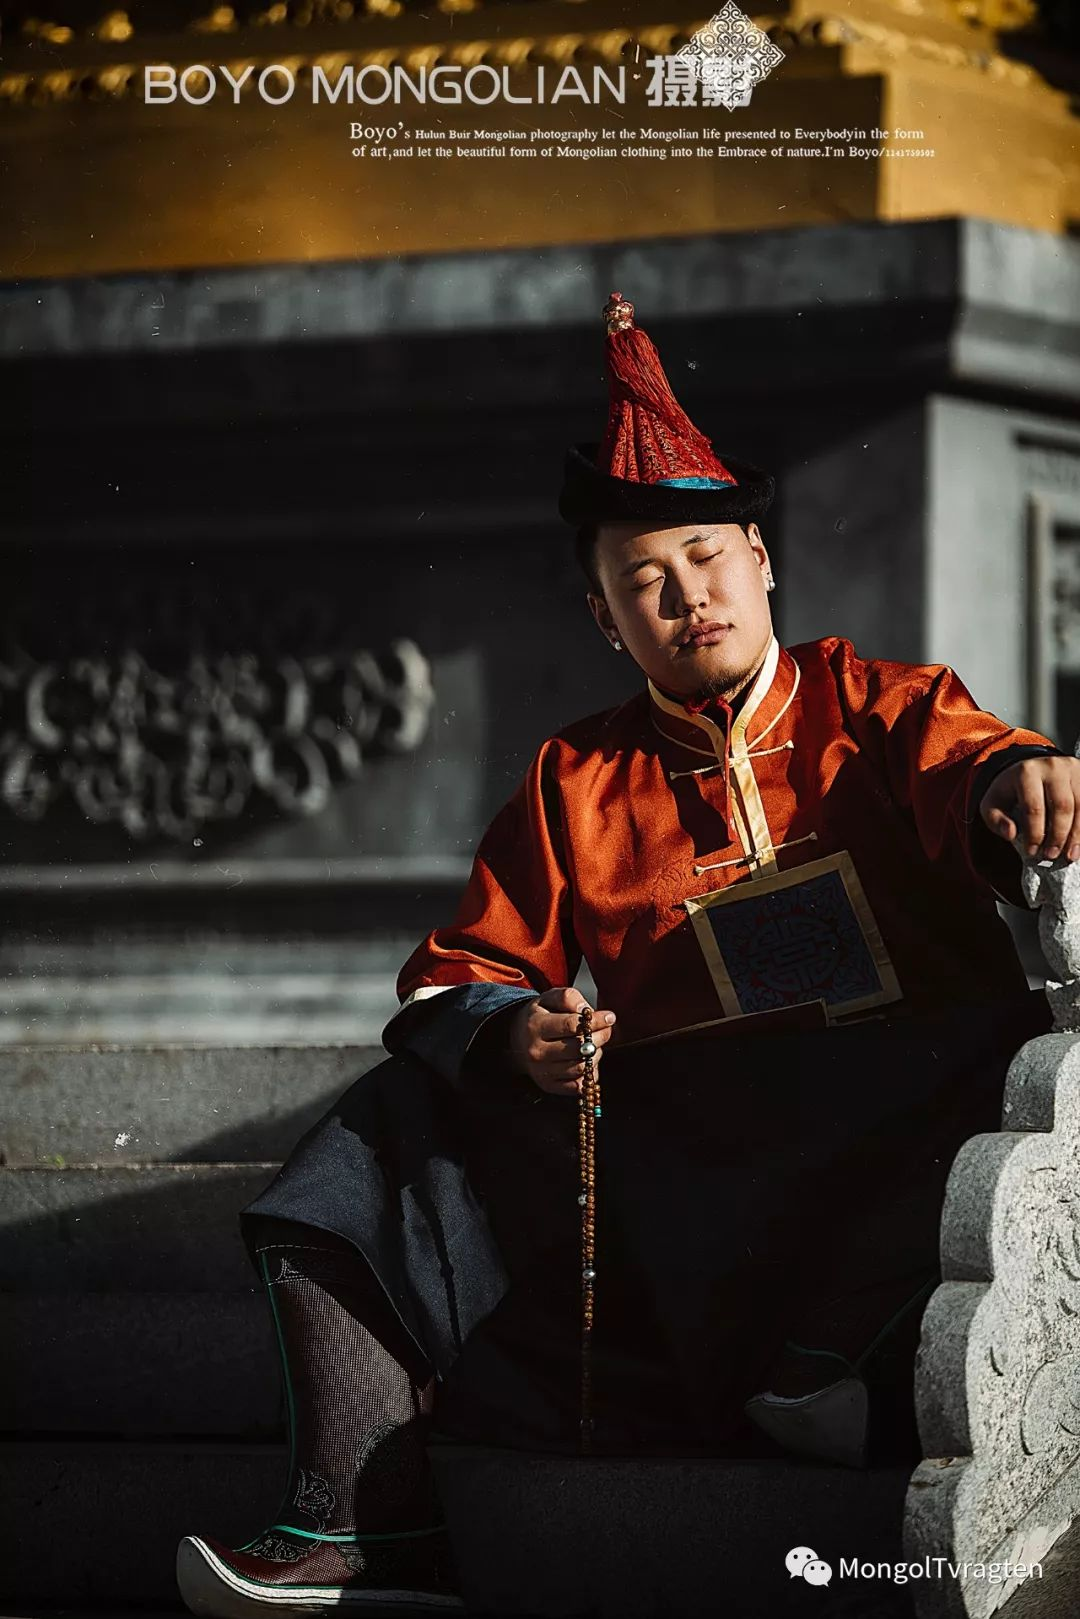 ᠪᠣᠶᠠᠨᠳᠡᠯᠭᠡᠷ ᠵᠢᠷᠣᠭᠯᠠᠯ 第36张 ᠪᠣᠶᠠᠨᠳᠡᠯᠭᠡᠷ ᠵᠢᠷᠣᠭᠯᠠᠯ 蒙古文化